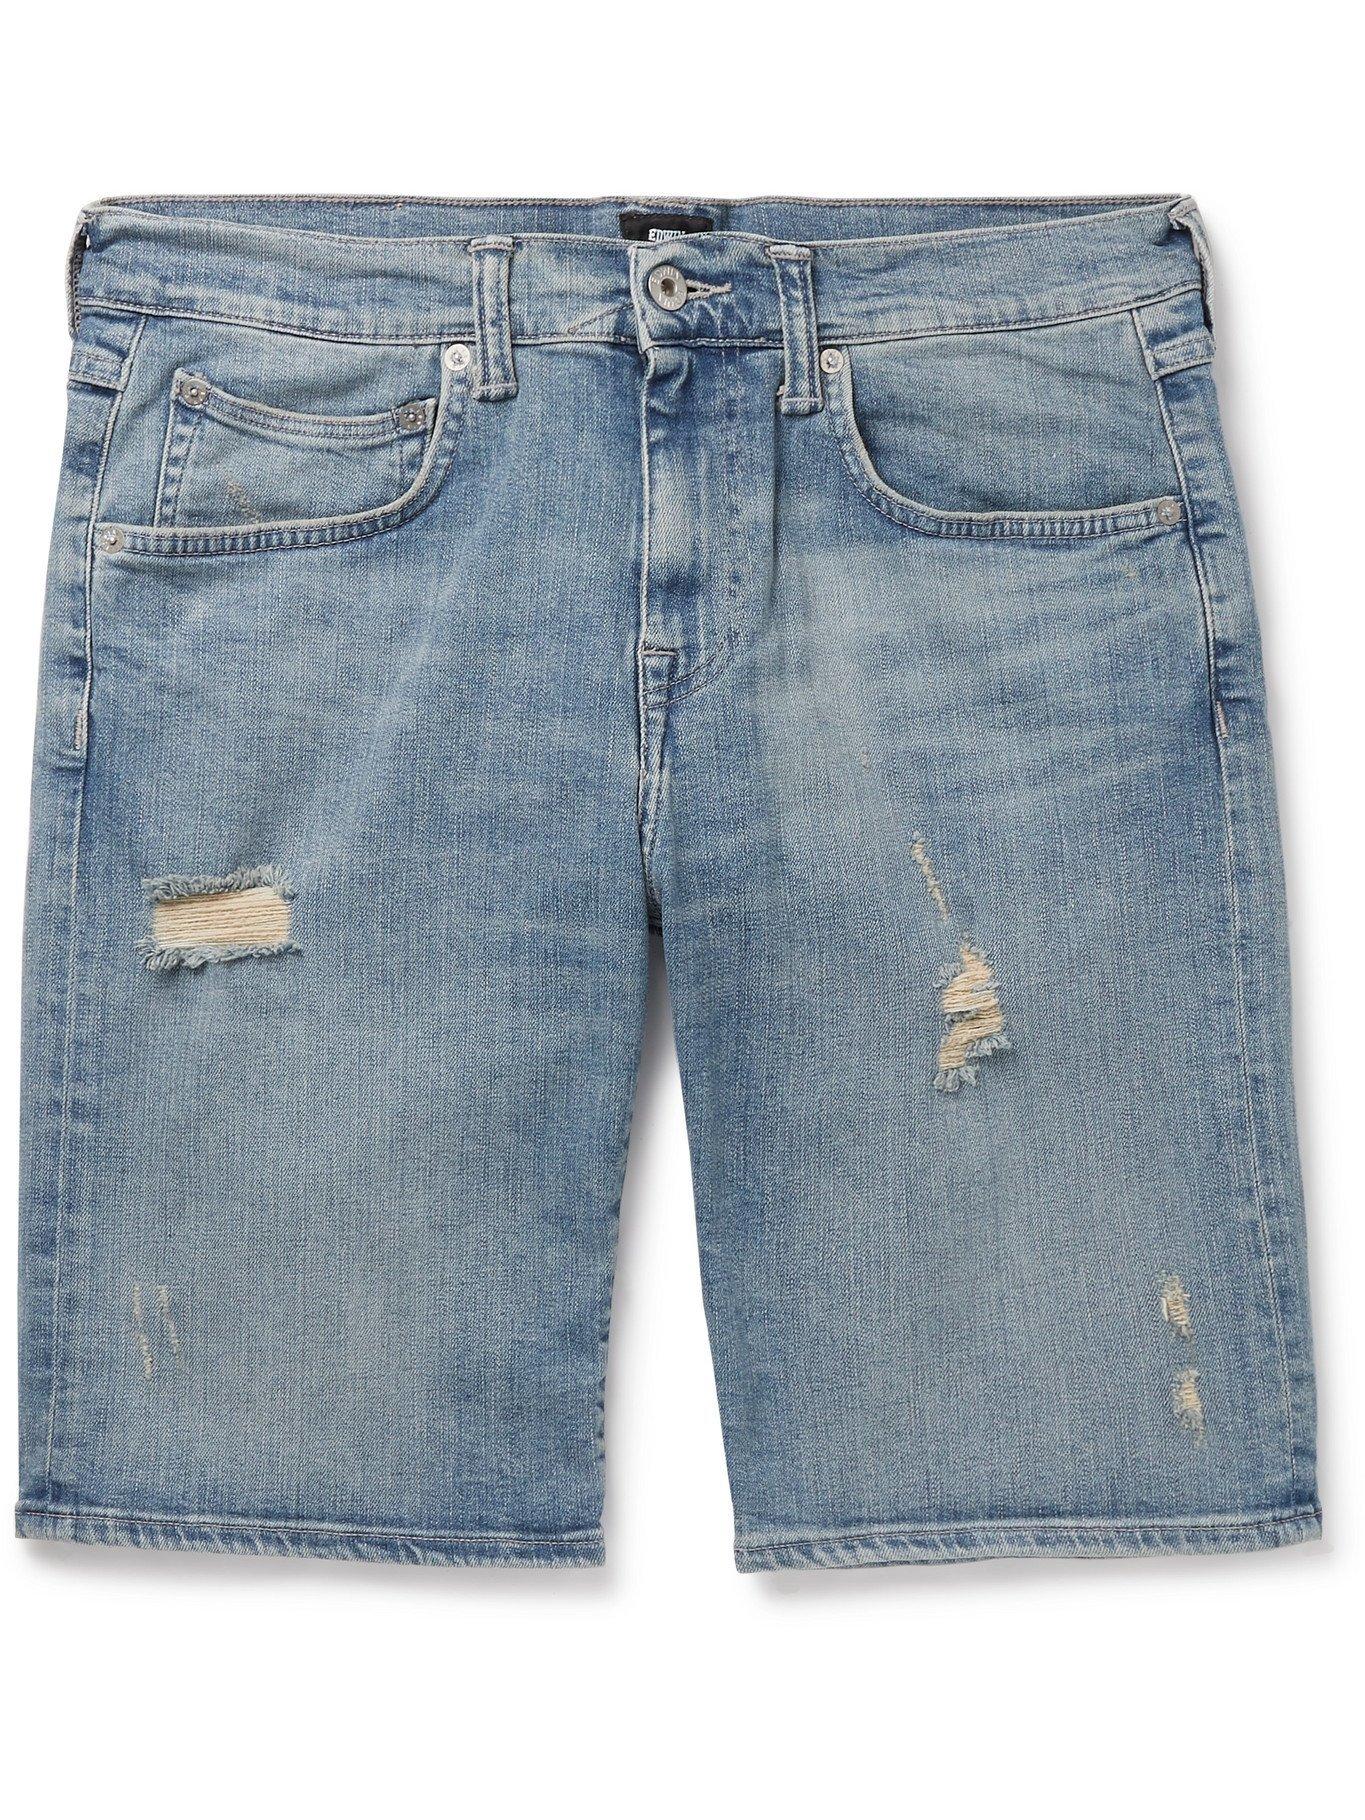 Photo: EDWIN - ED-55 Distressed Denim Shorts - Blue